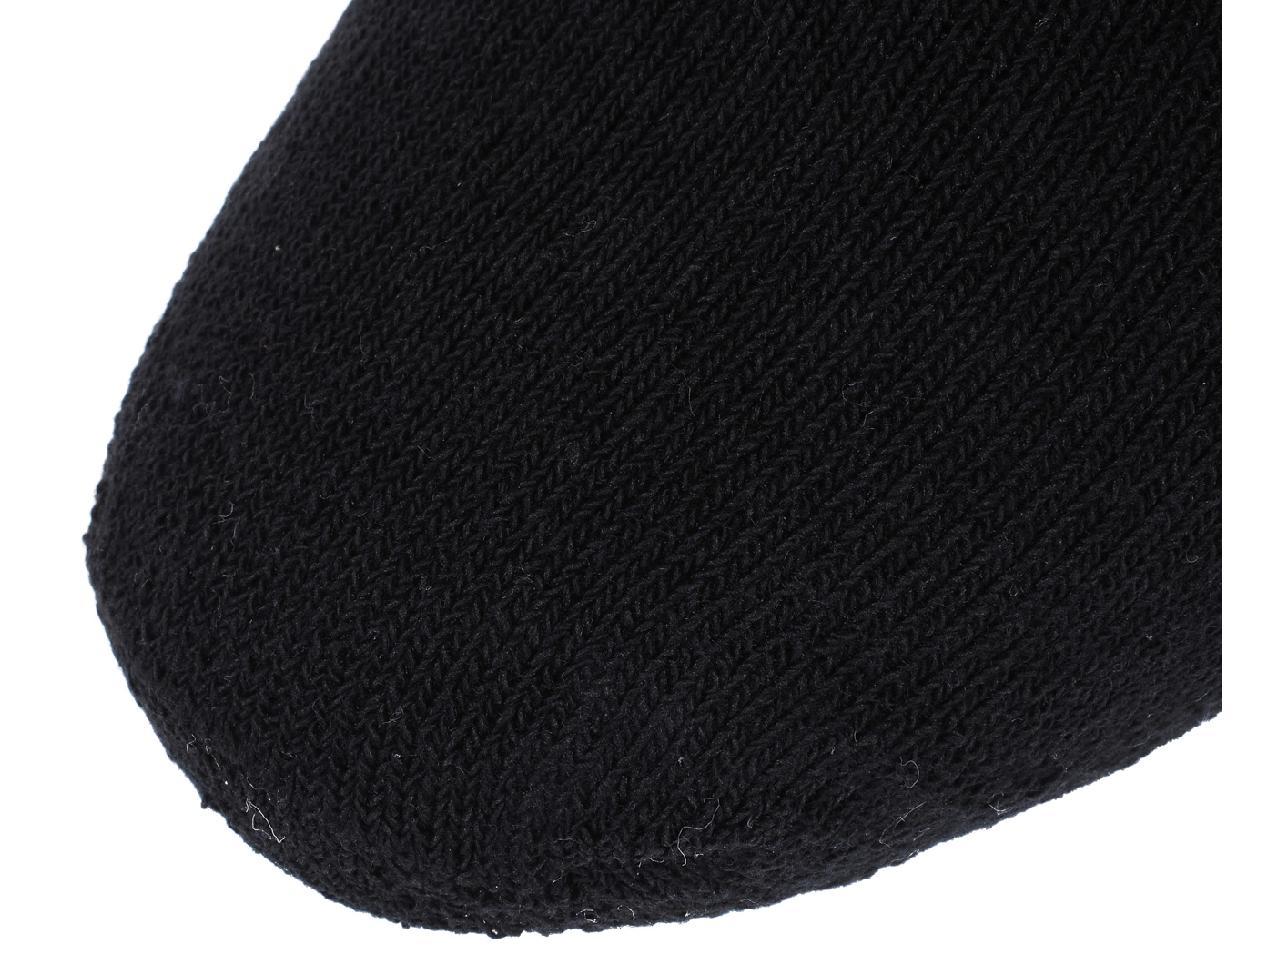 Chaussettes-Freegun-Logo-noir-blc-3-paires-Noir-27534-Neuf